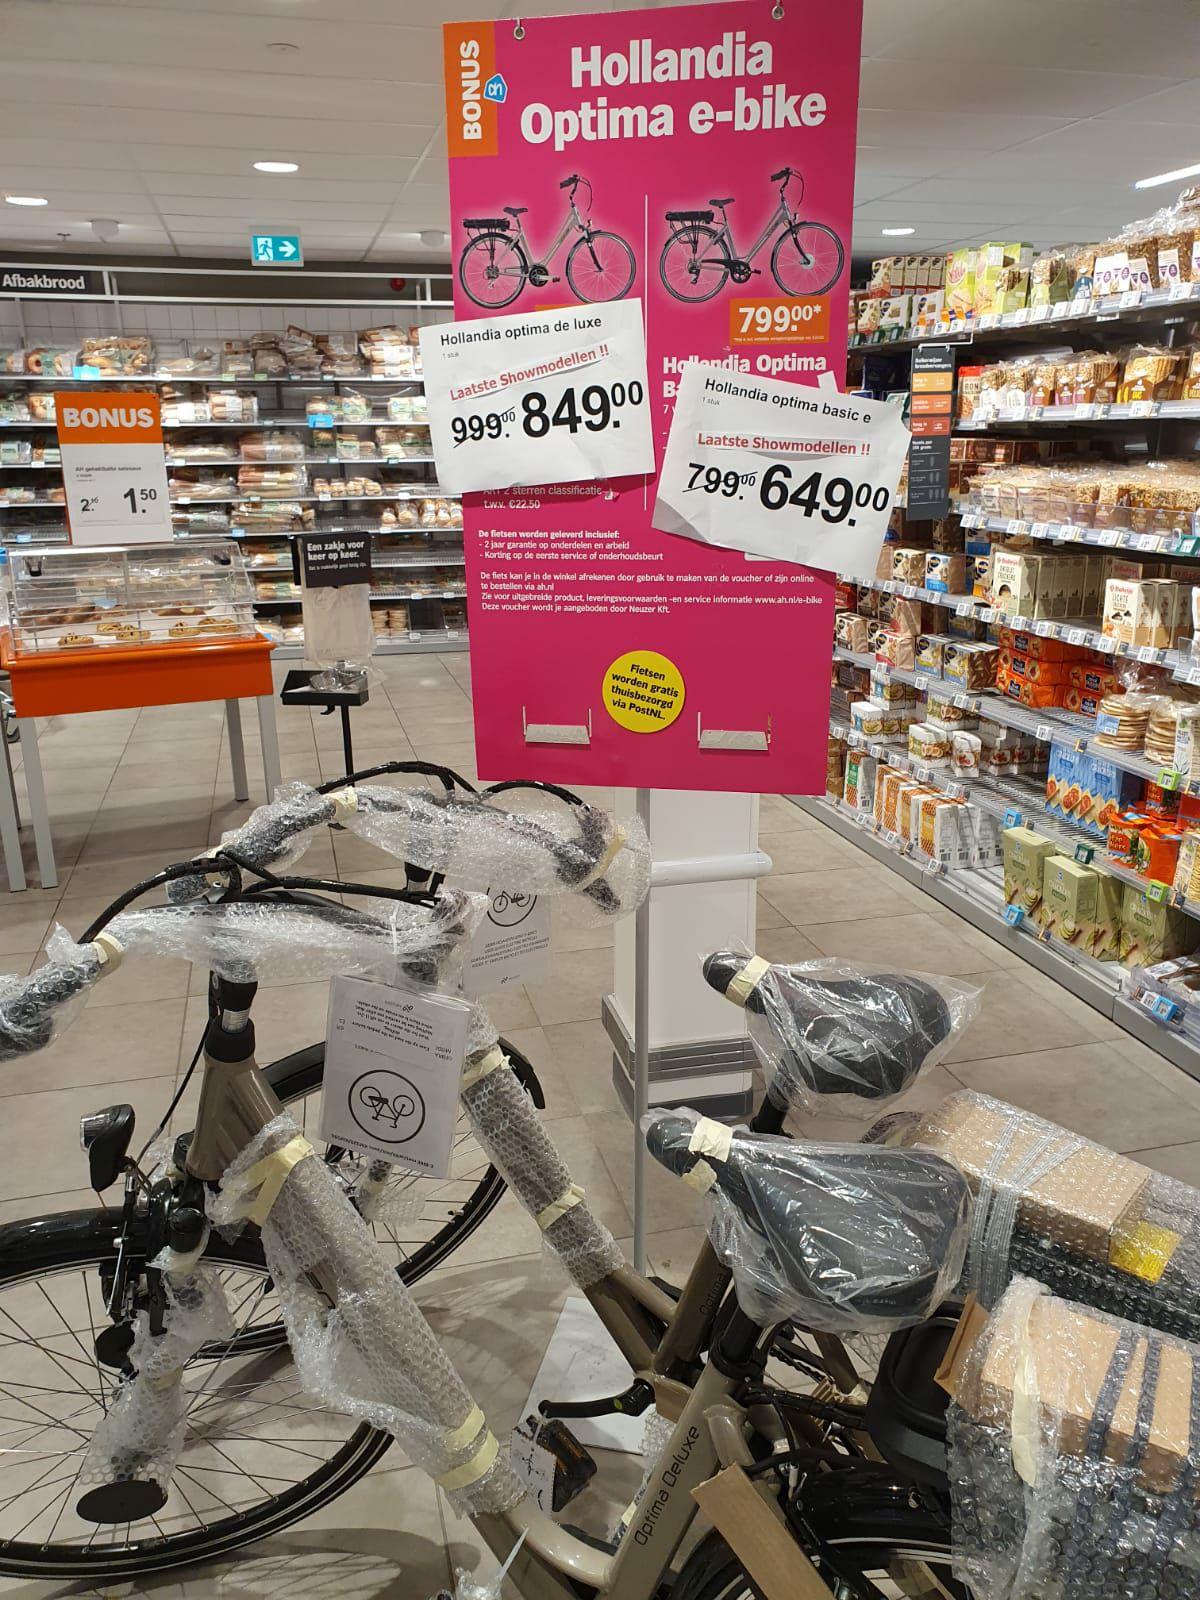 Hollandia e-bike basic Albert Heijn